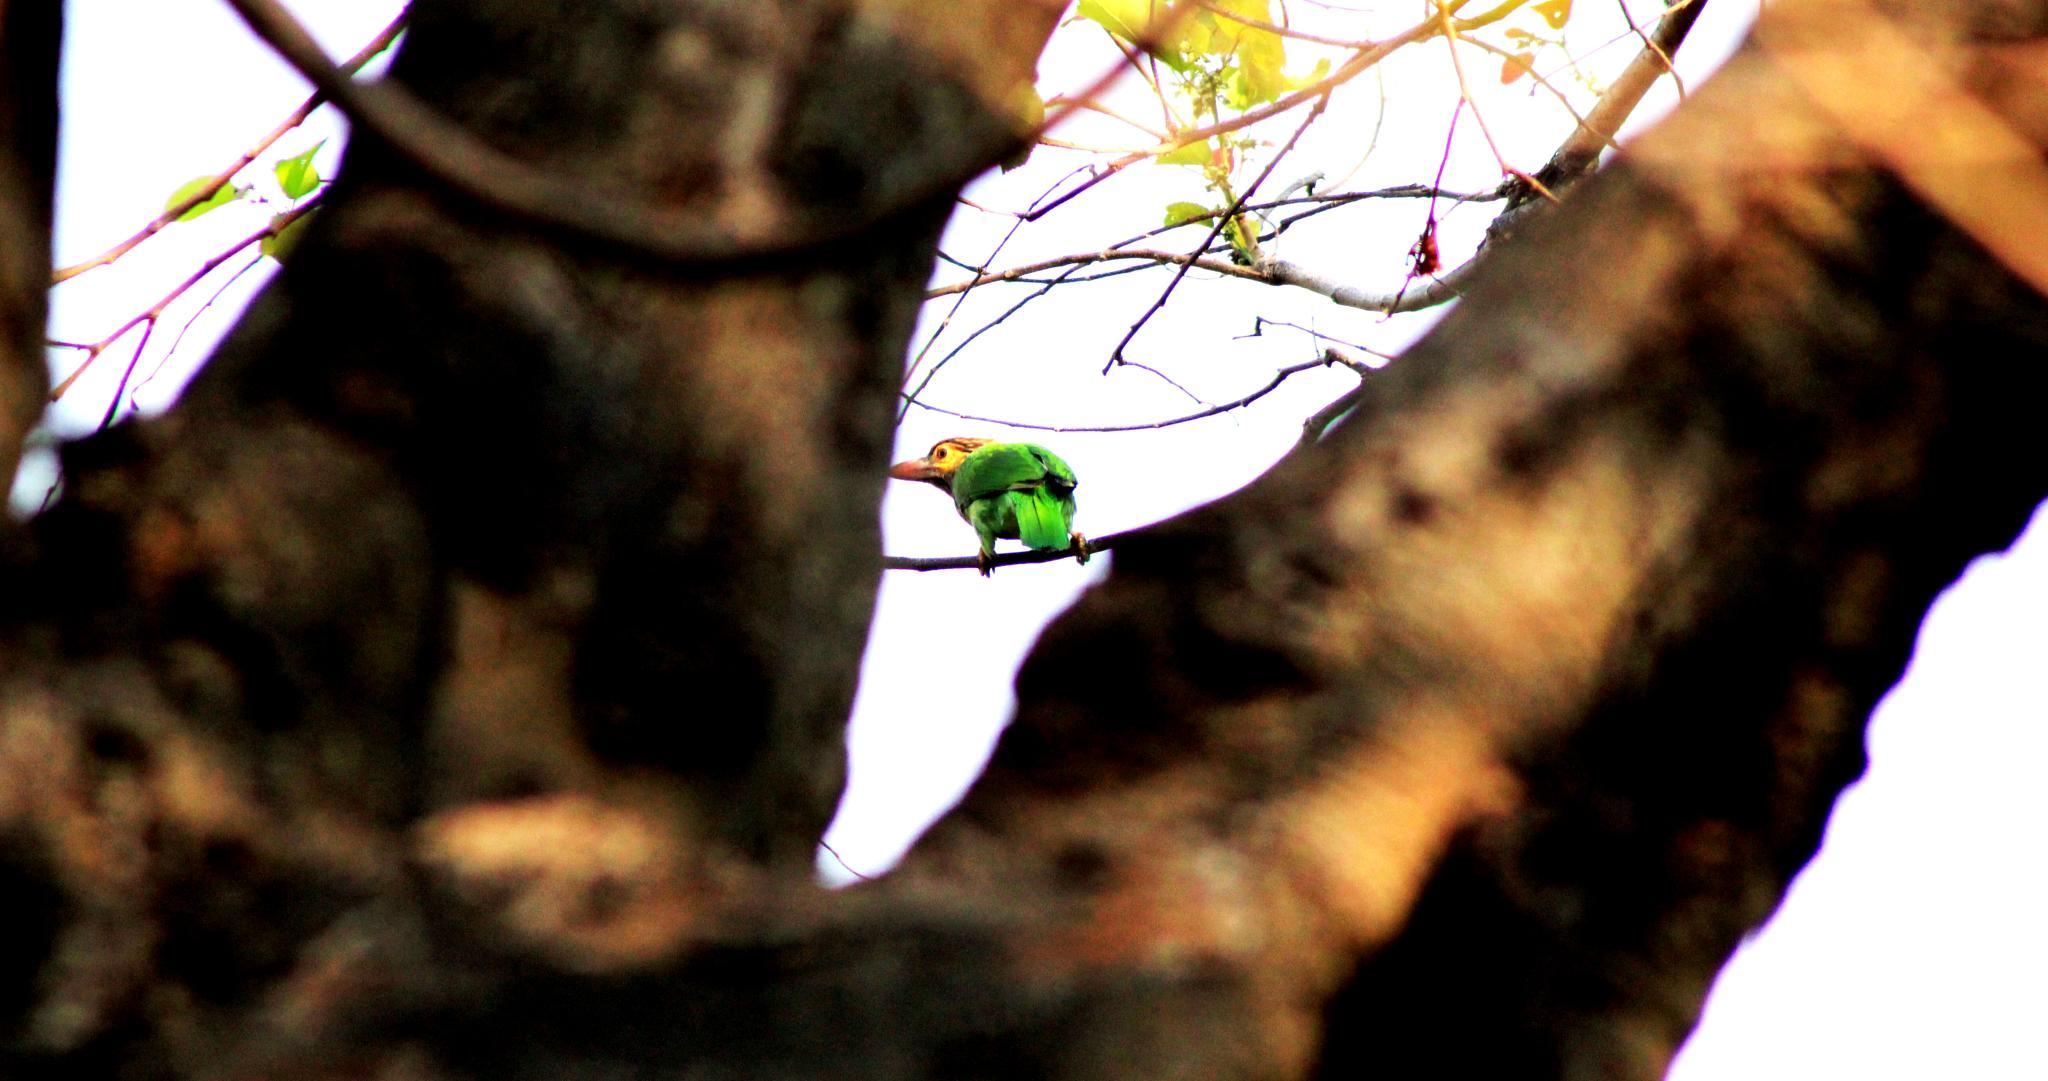 Untitled by Gee Iyappan